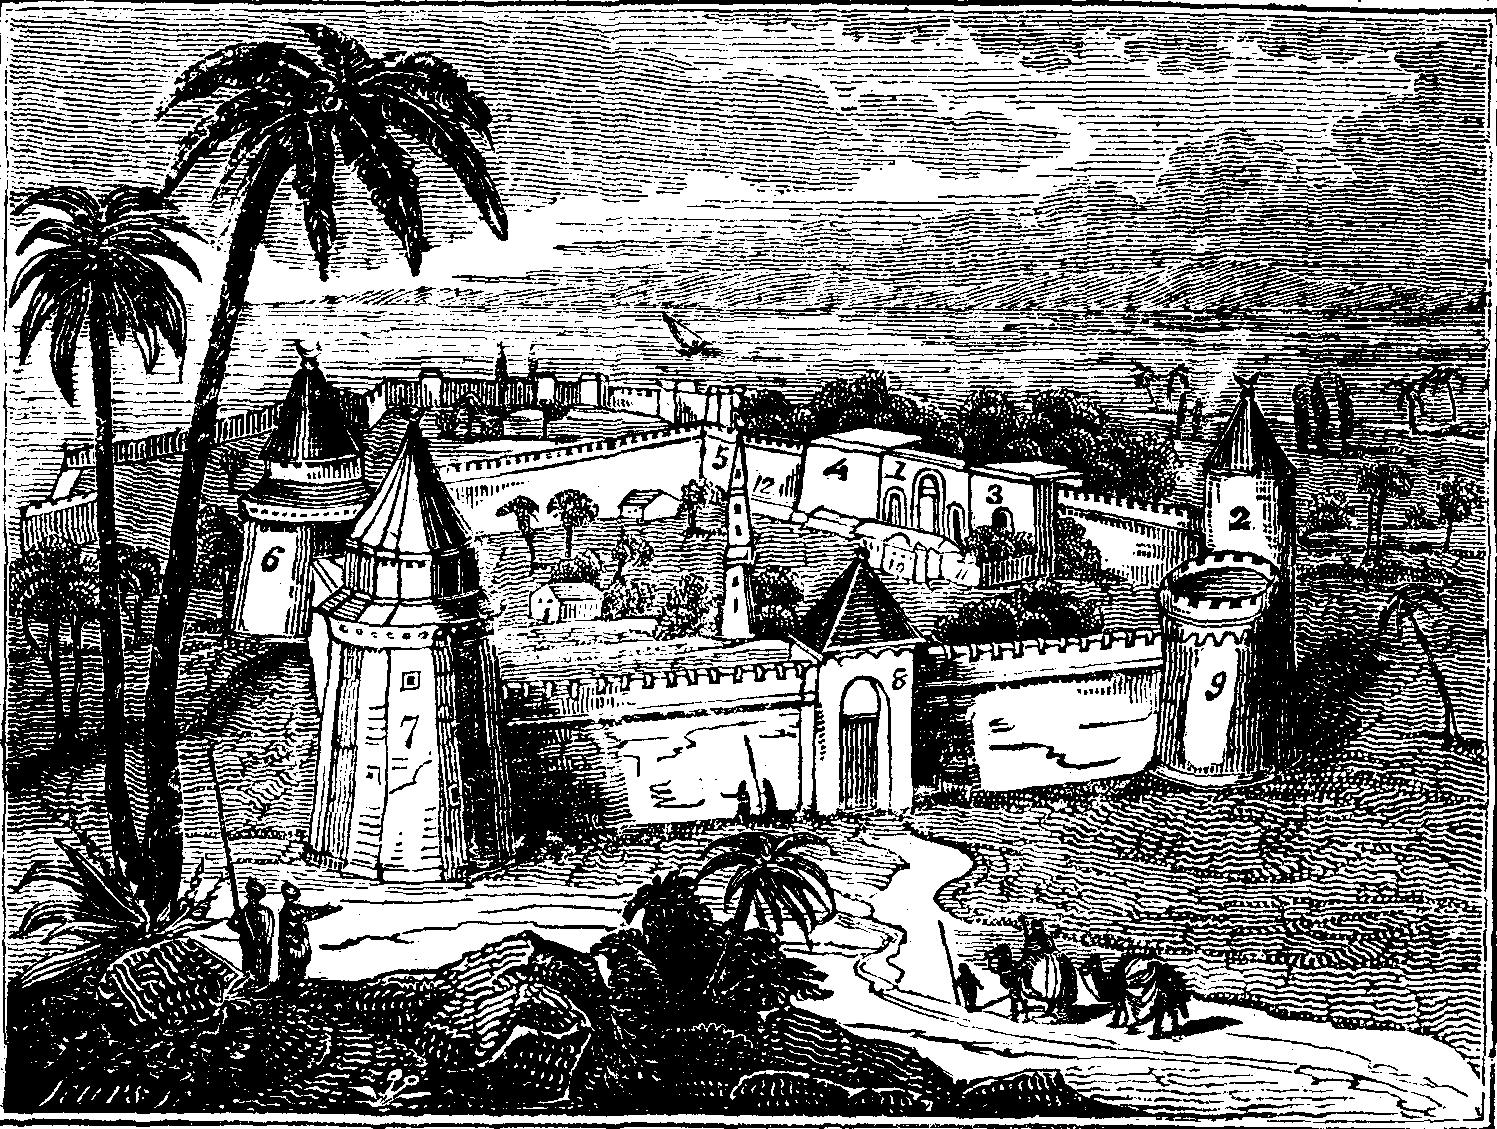 Jedykuła Yedikule rycina z The Mirror of Literature, Amusement, and Instruction. Vol. 10. No. 285. December 1, 1827.JPG